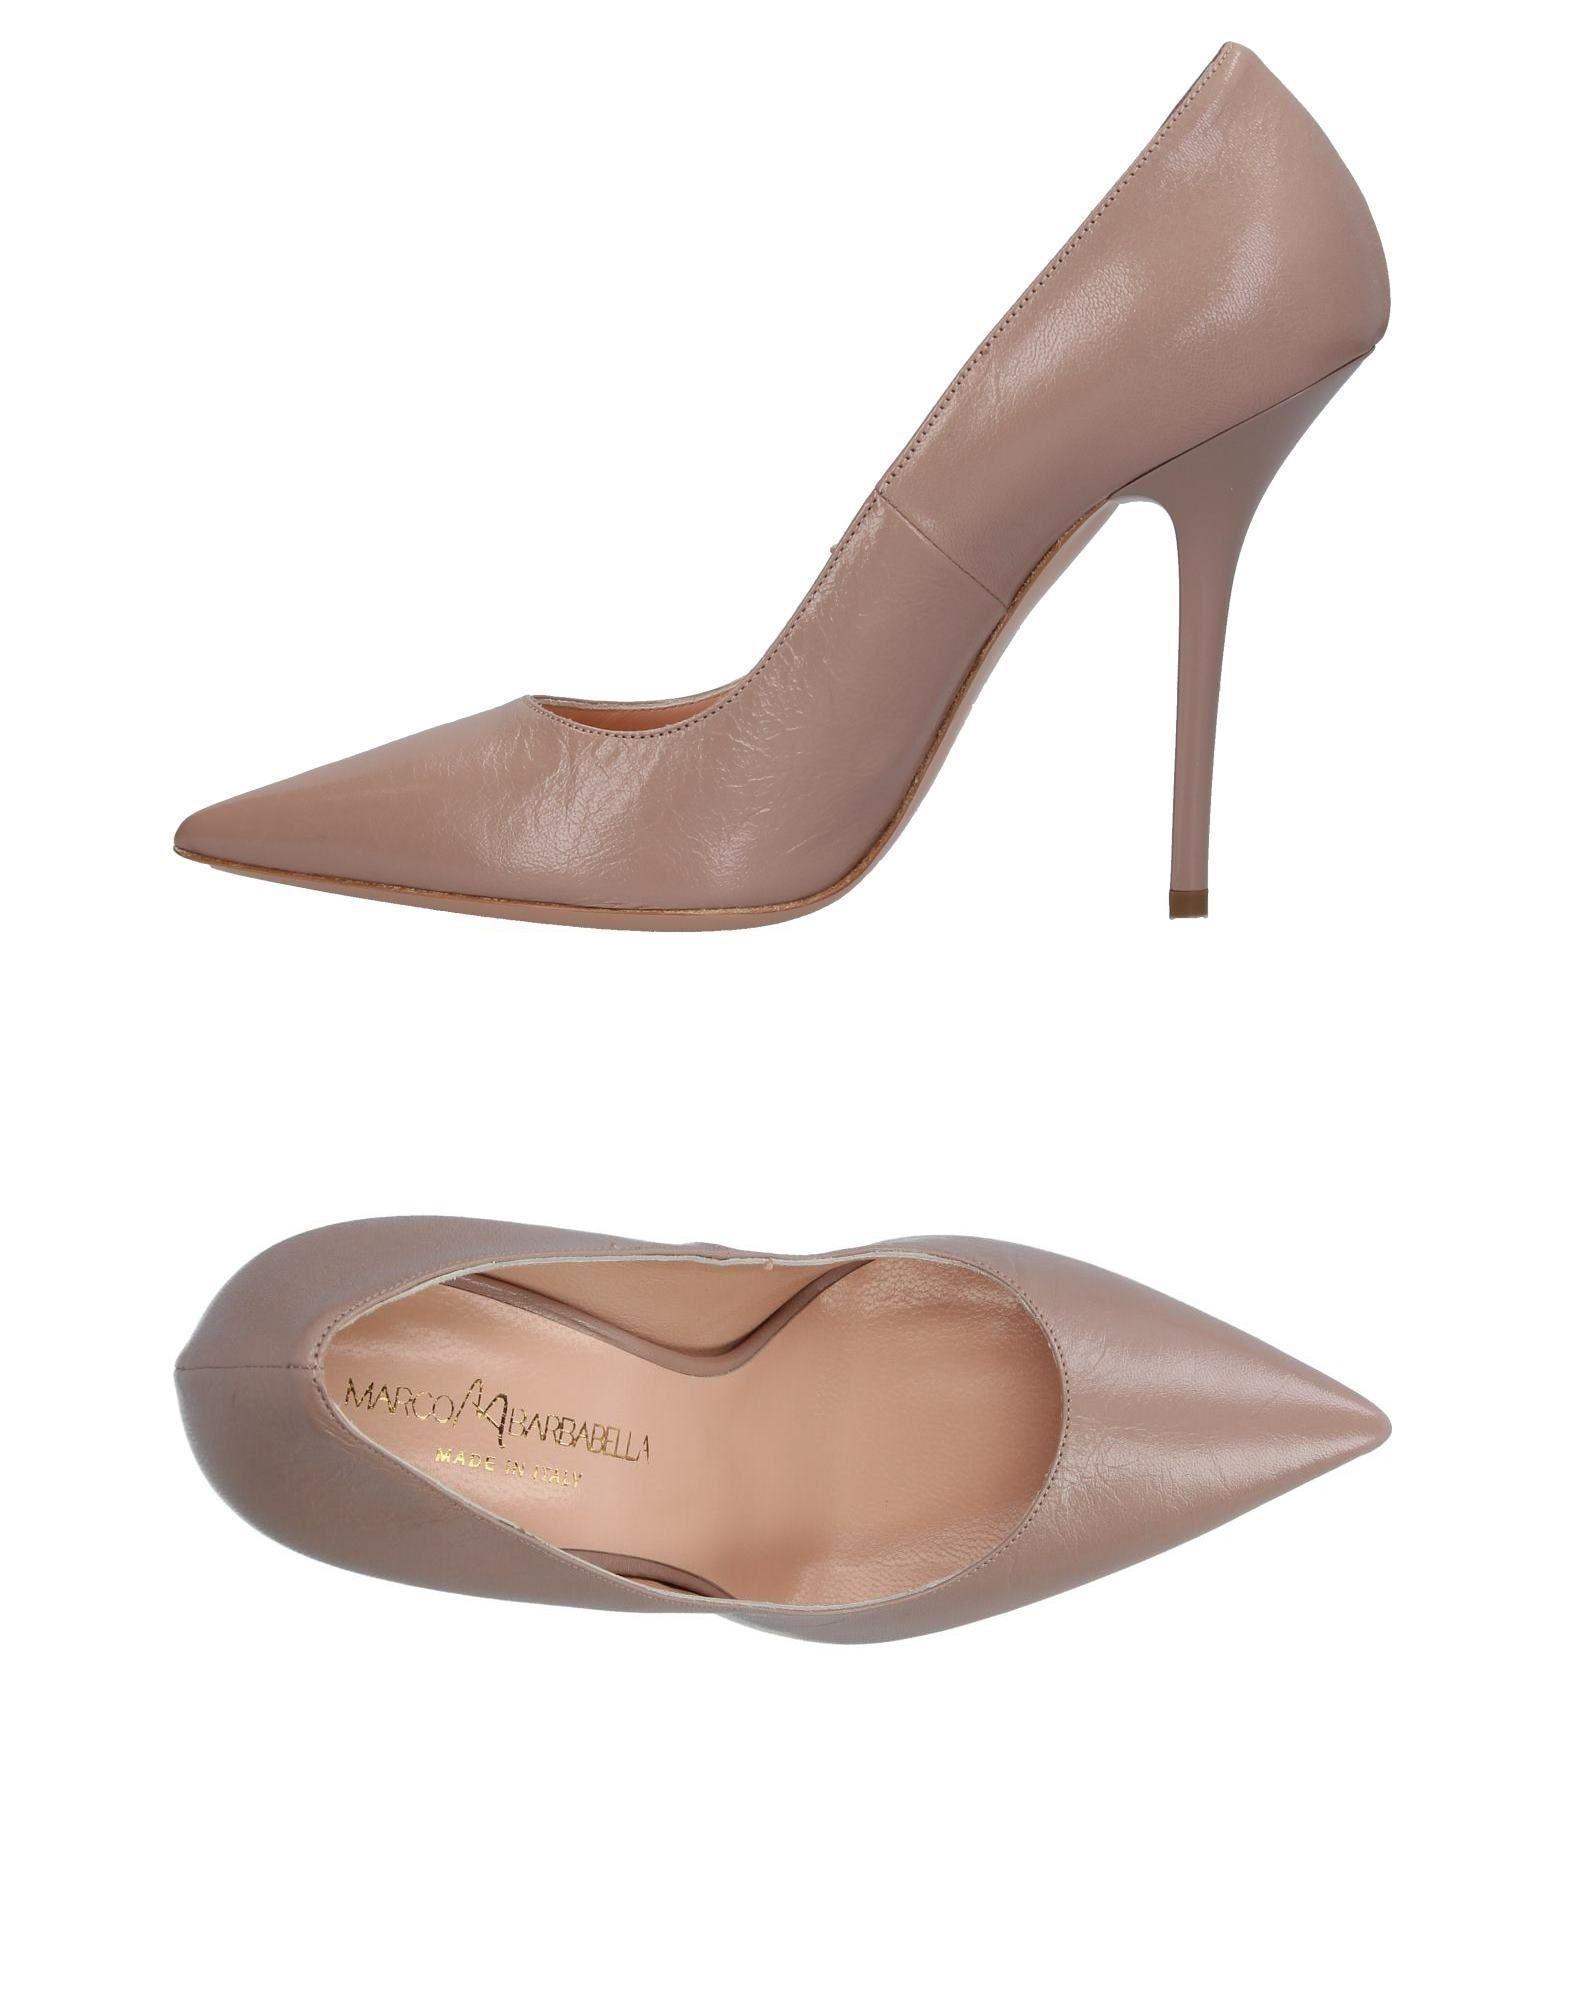 Stilvolle billige Pumps Schuhe Marco Barbabella Pumps billige Damen  11354031RQ 2c5e4c